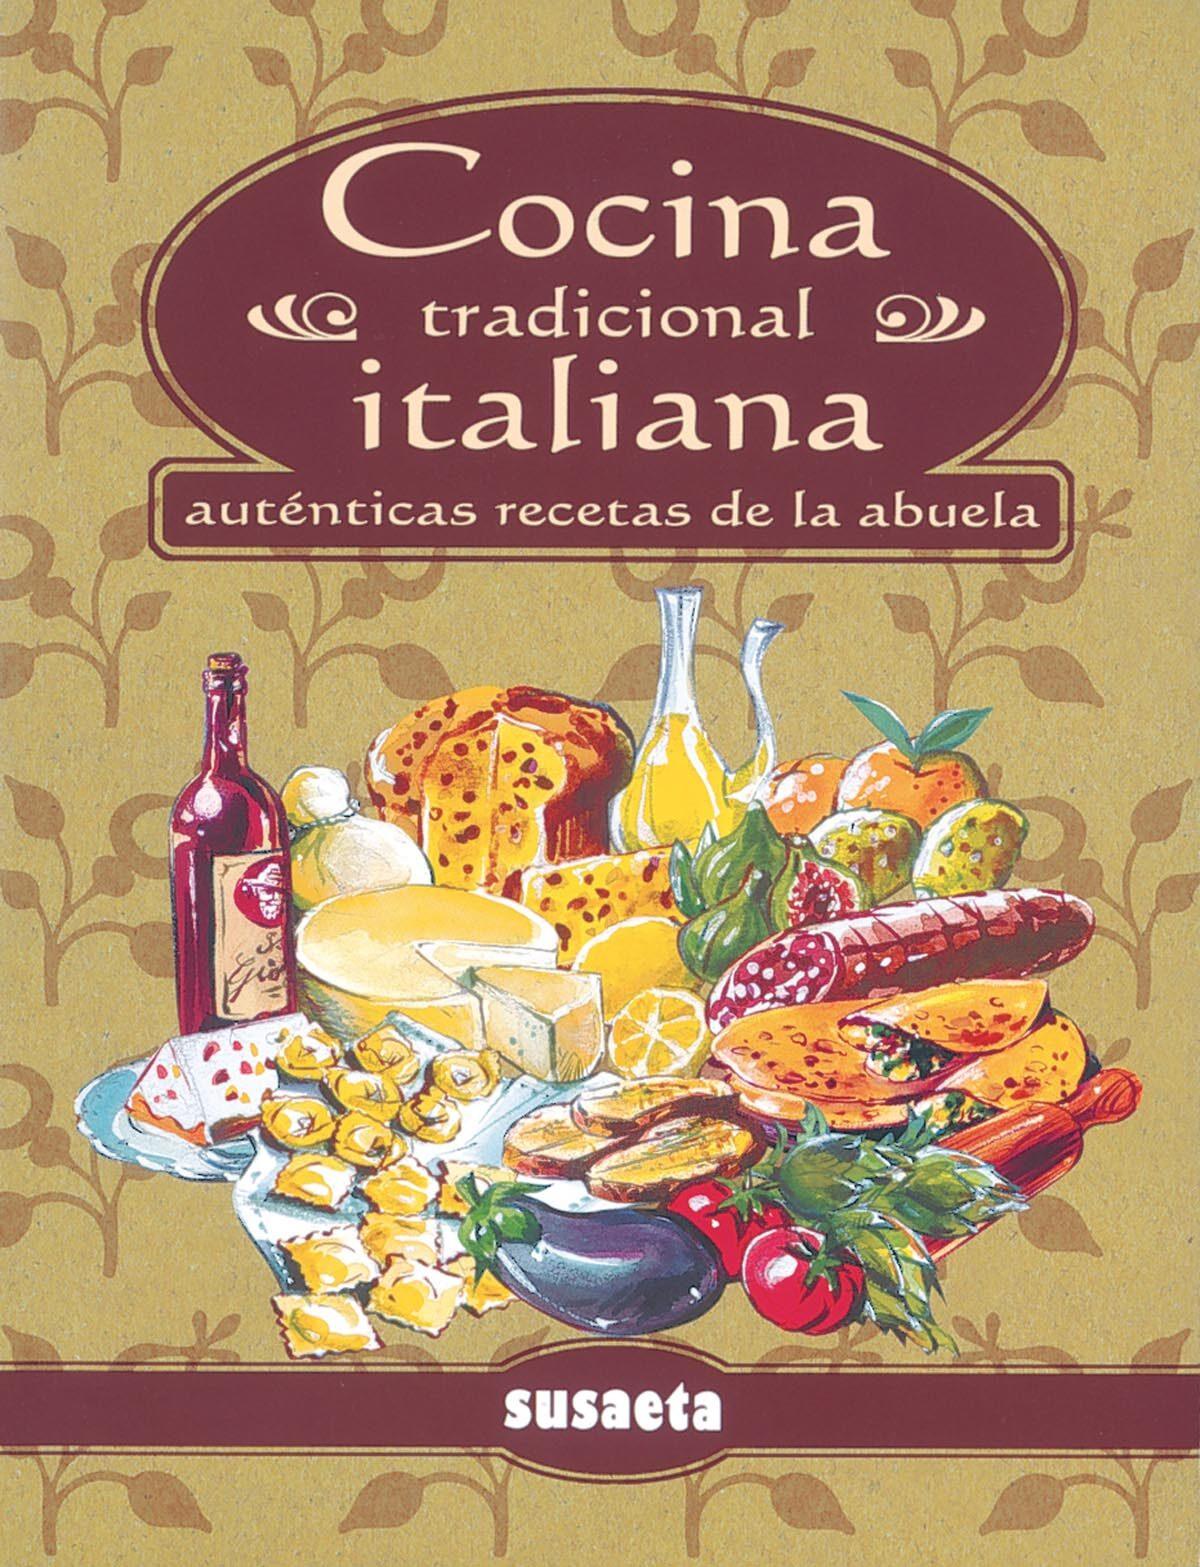 Cocina Tradicional Italiana - Vv.aa.